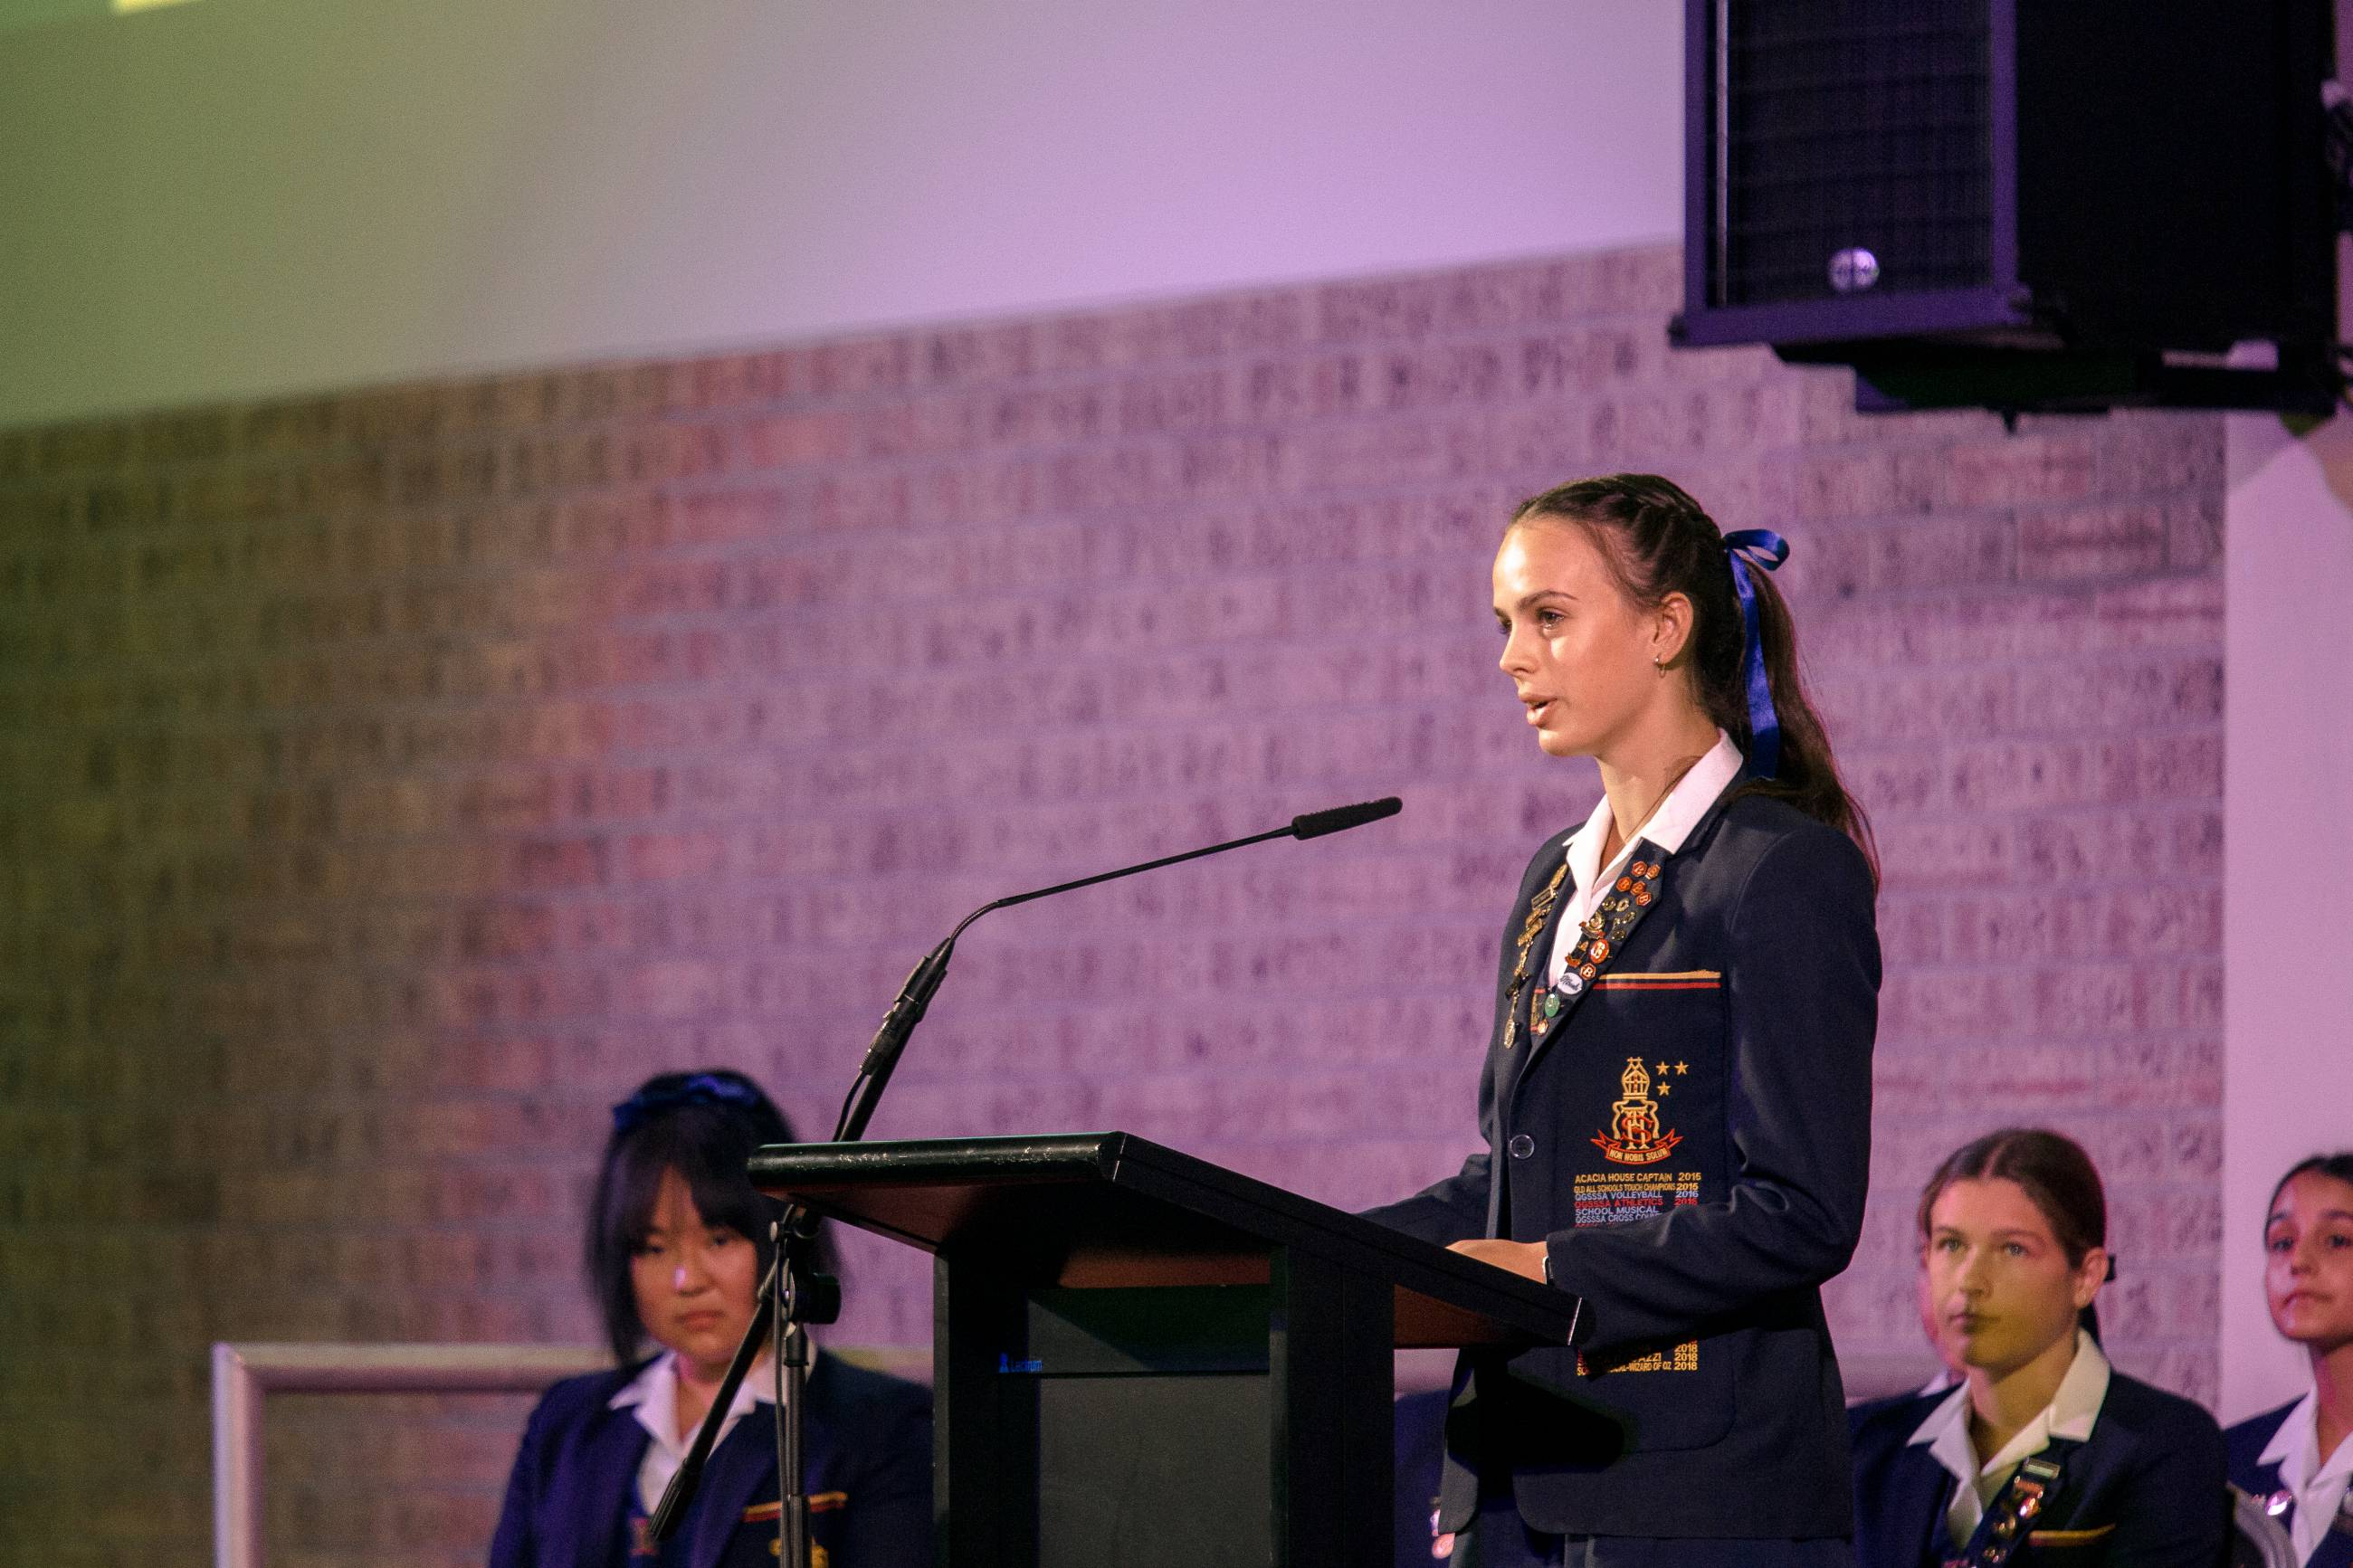 School Captain Addressing Assembly